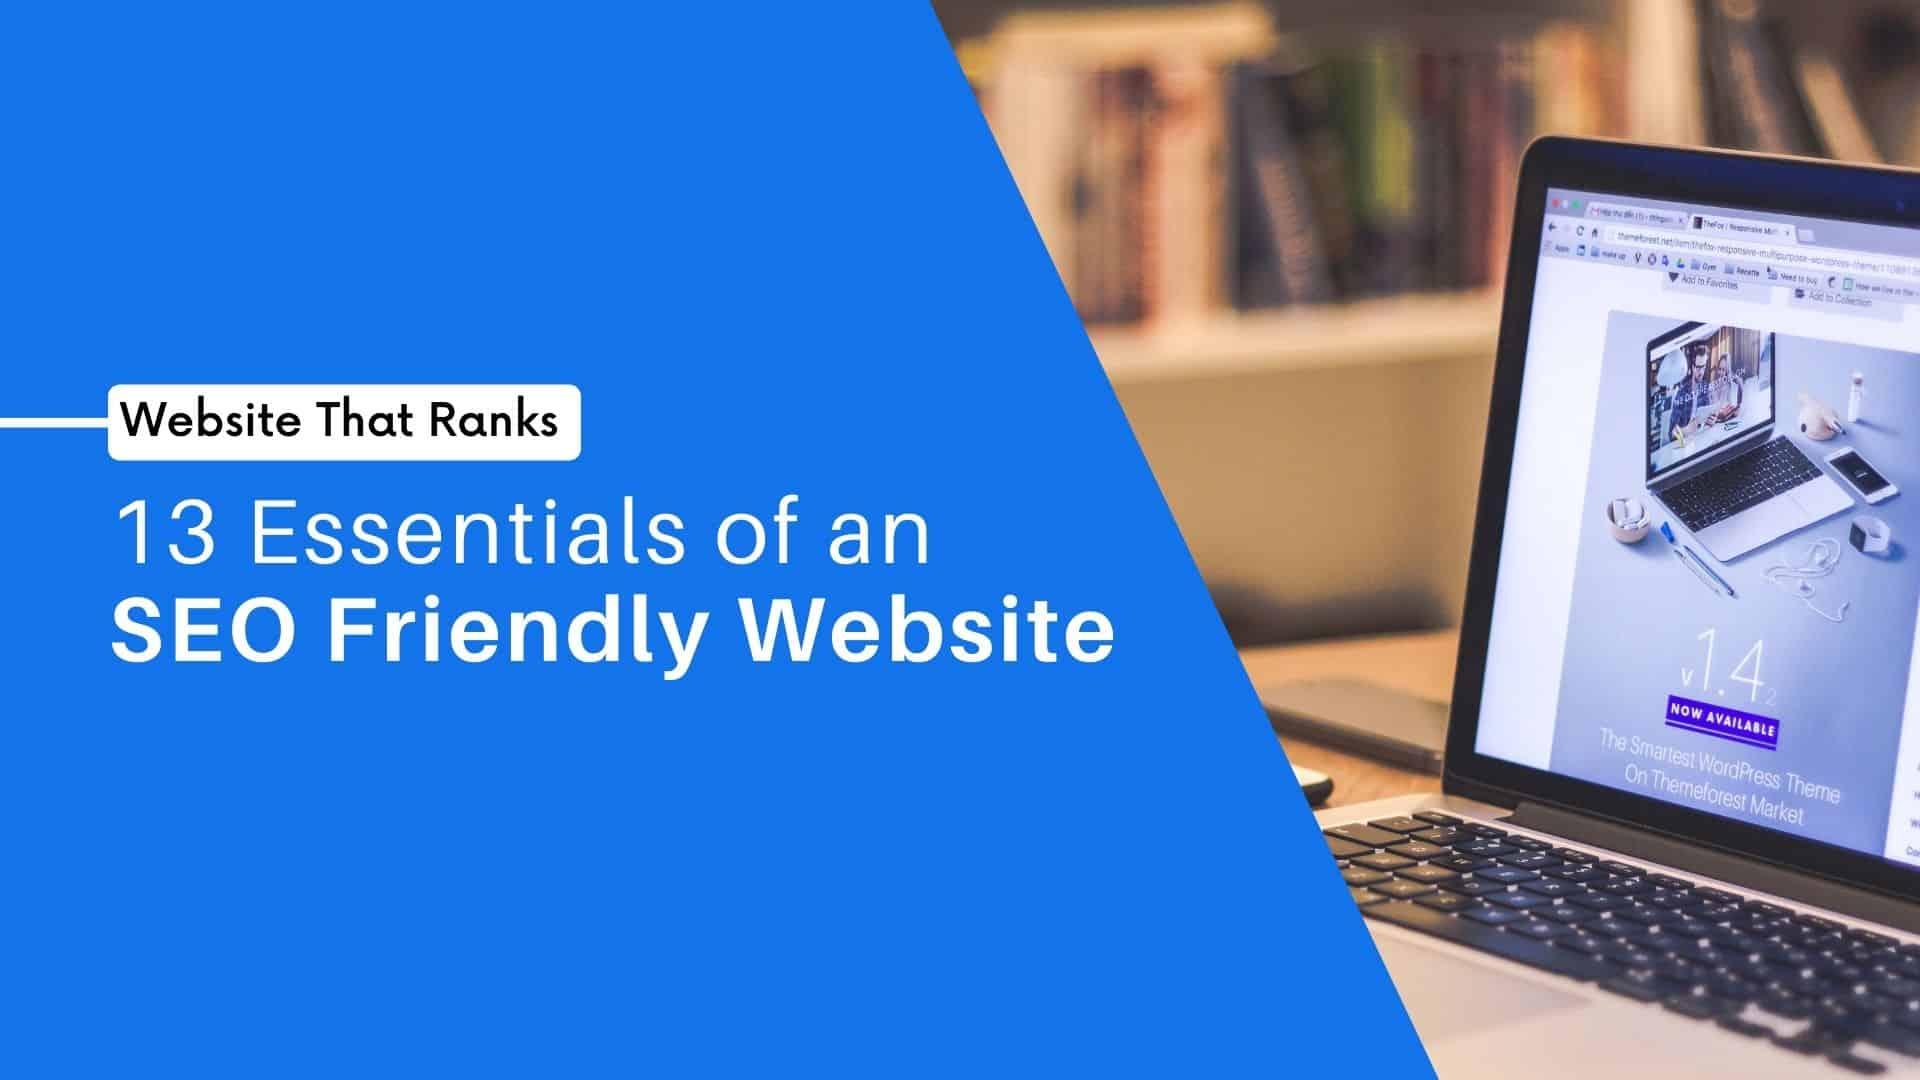 13-Essentials-of-an-SEO-Friendly-Website-by-darshan-patel.jpg